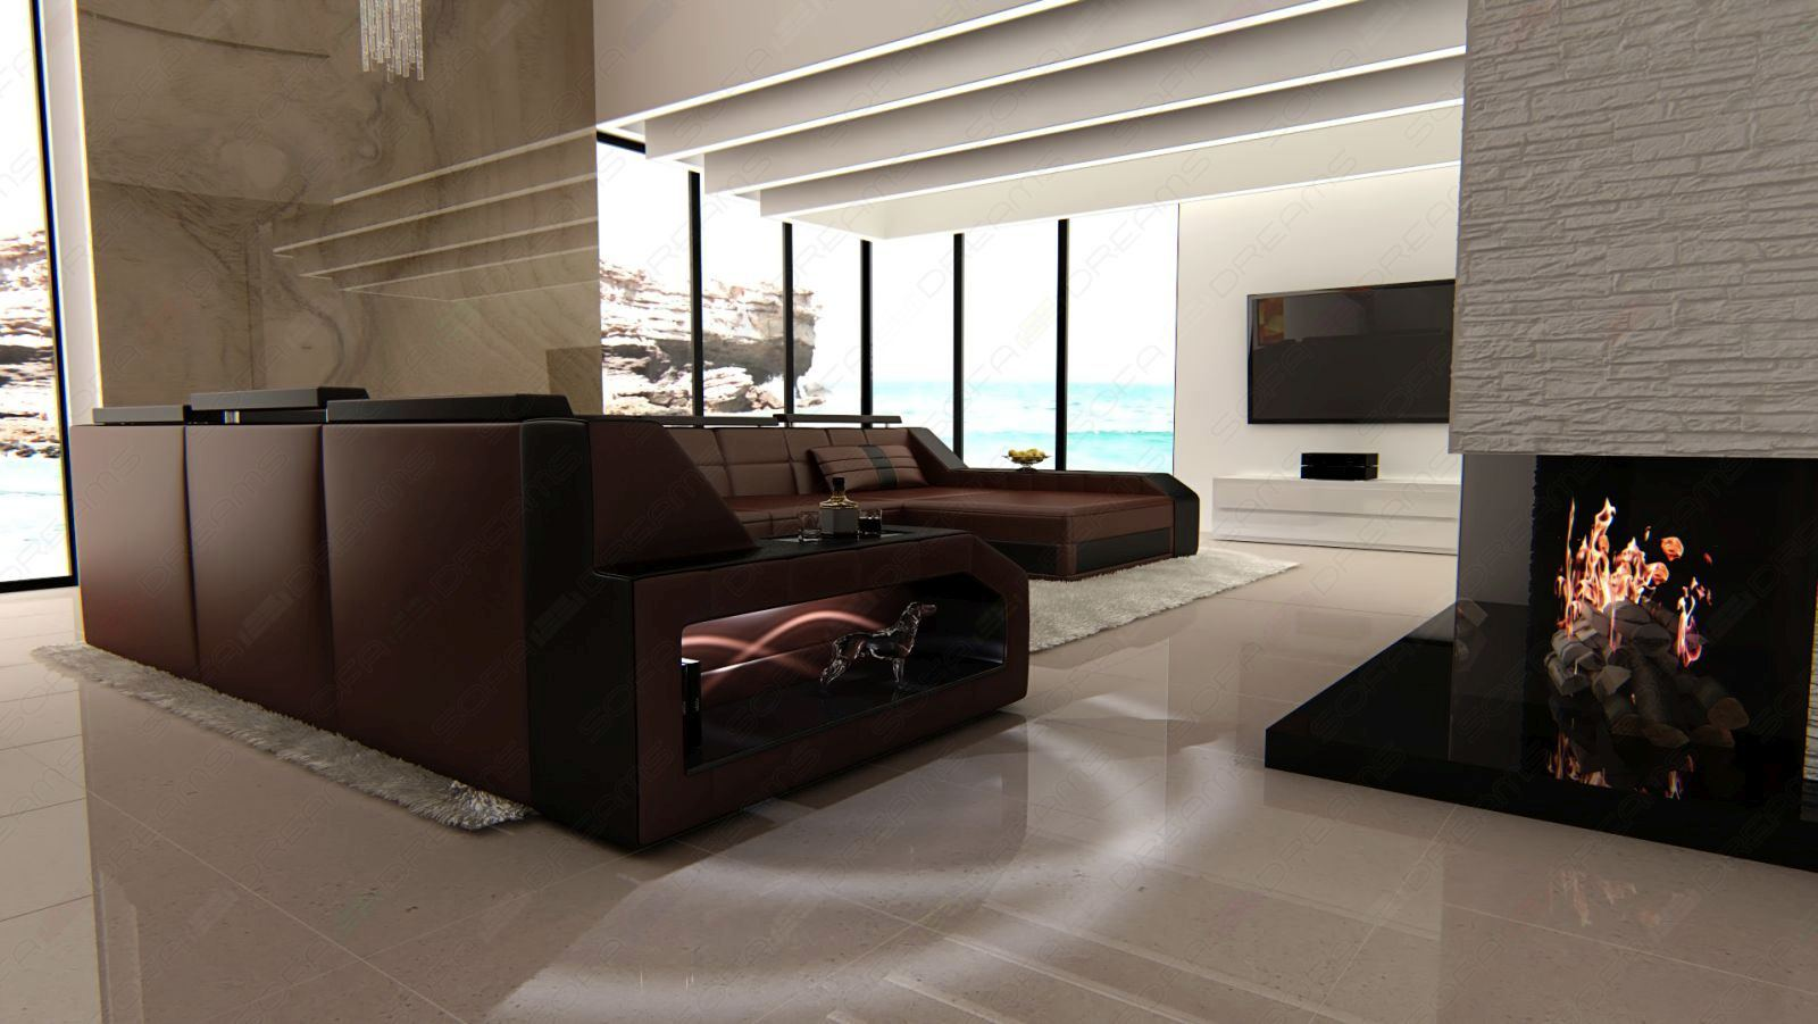 xxl leder wohnlandschaft matera u form designercouch beleuchtung ebay. Black Bedroom Furniture Sets. Home Design Ideas